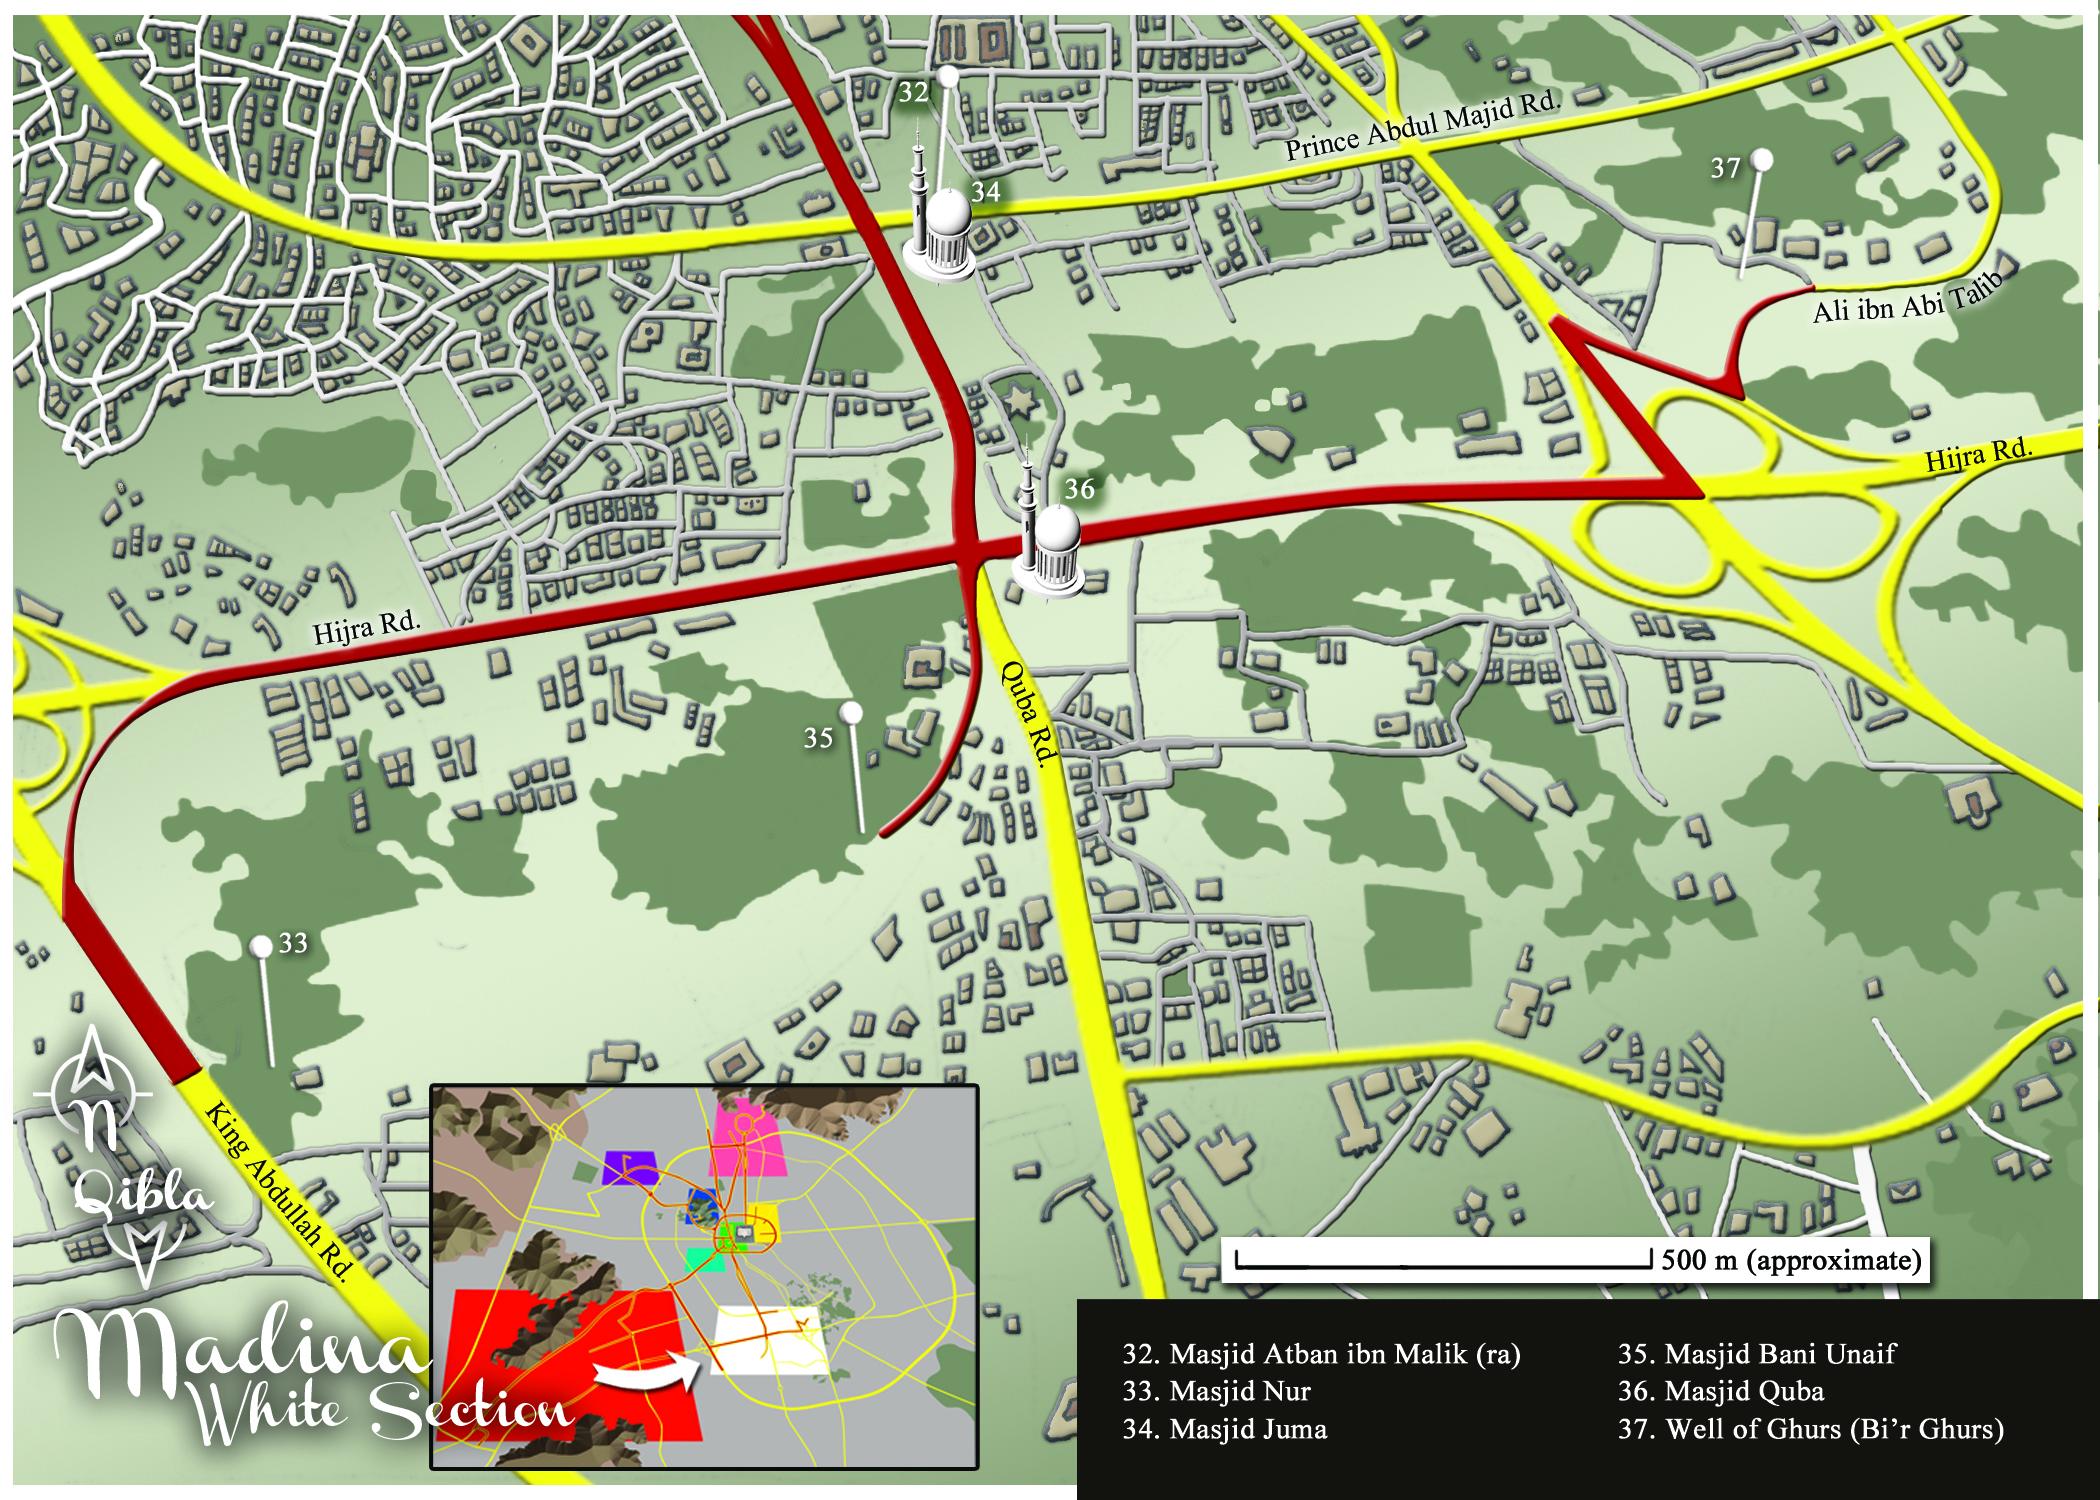 Medina Map: White Section Detail